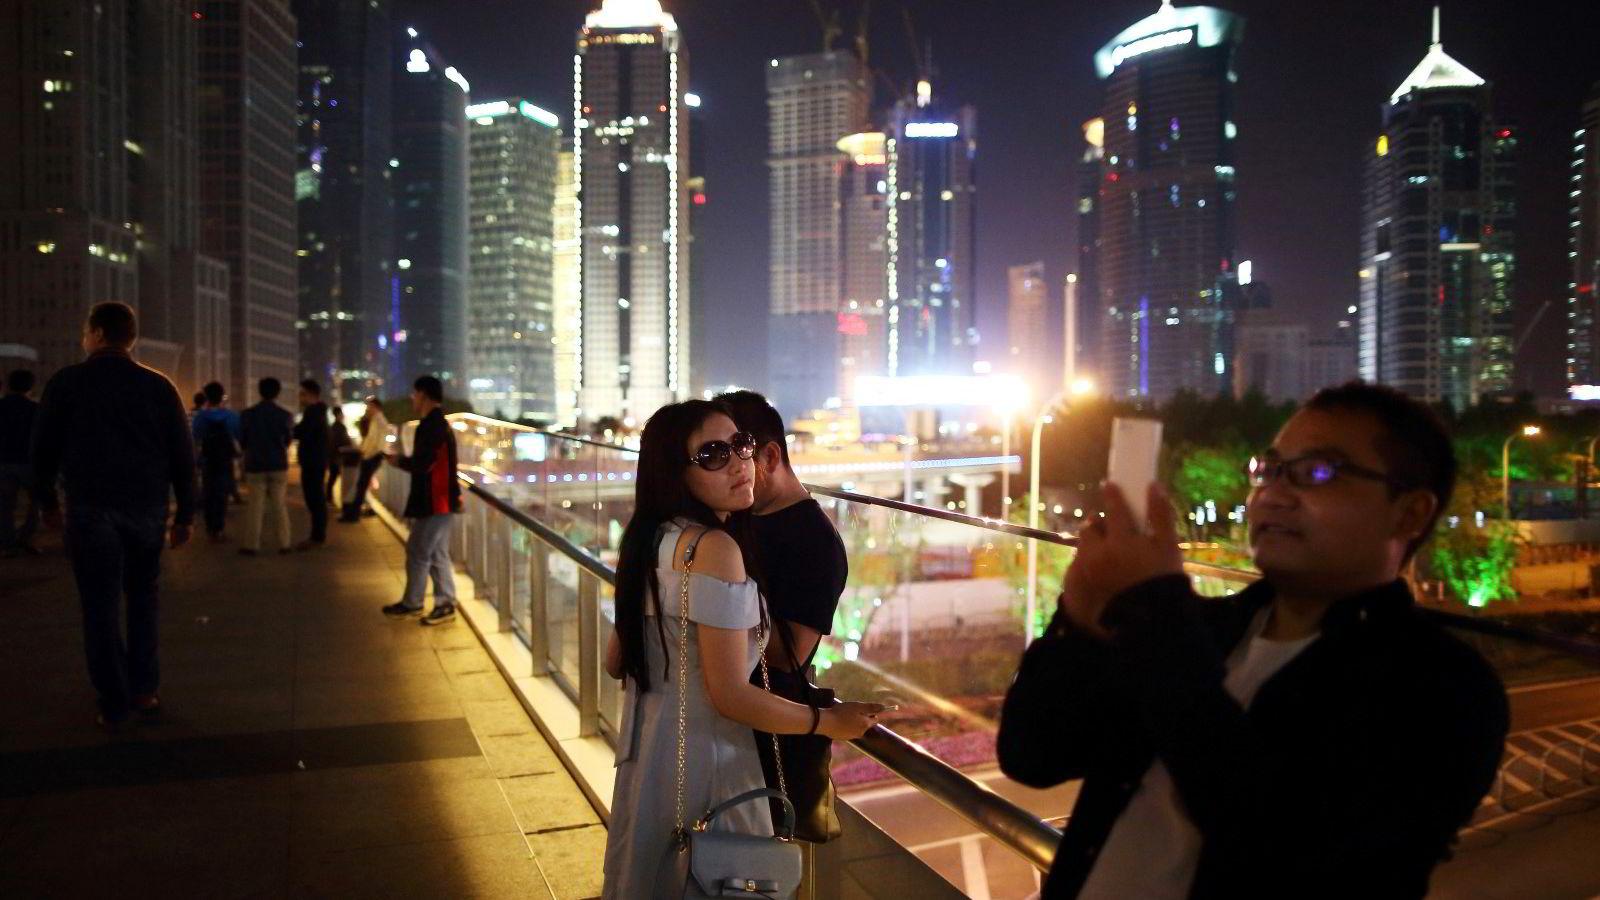 Goldman Sachs og Franklin Templeton tror det snur i Brics-landene. Illustrasjonsfotoet viser en mann som tar bilder med sin smarttelefon mens folk rusler rundt i Lujiazui-distriktet i Shanghai. Foto:  Tomohiro Ohsumi/